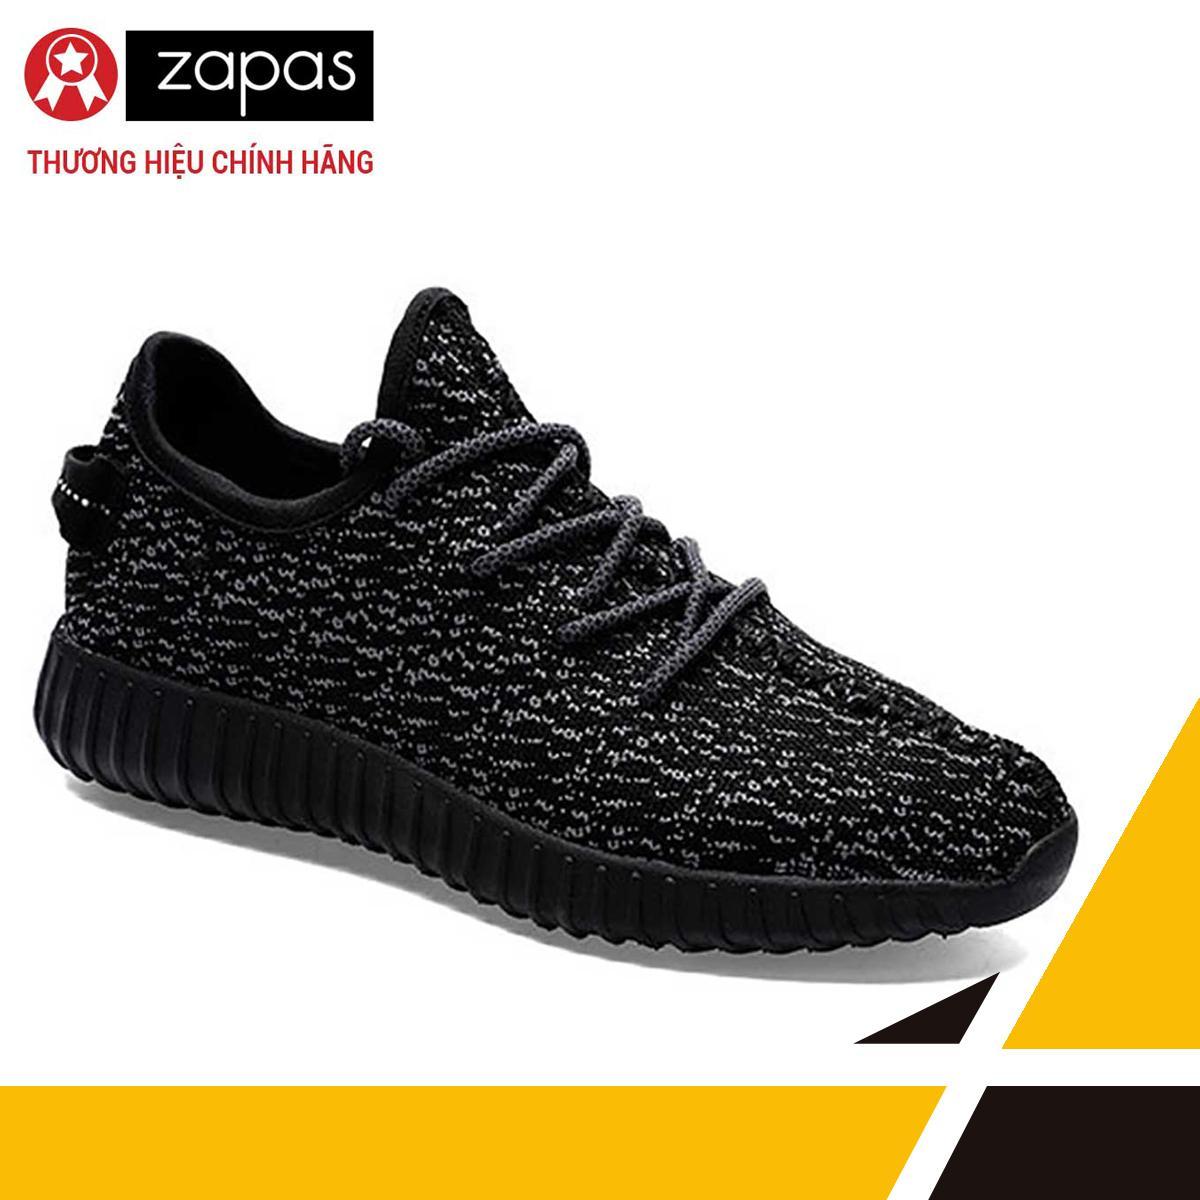 Giày Sneaker Thể Thao Nam Zapas – GS011 (Màu Đen)